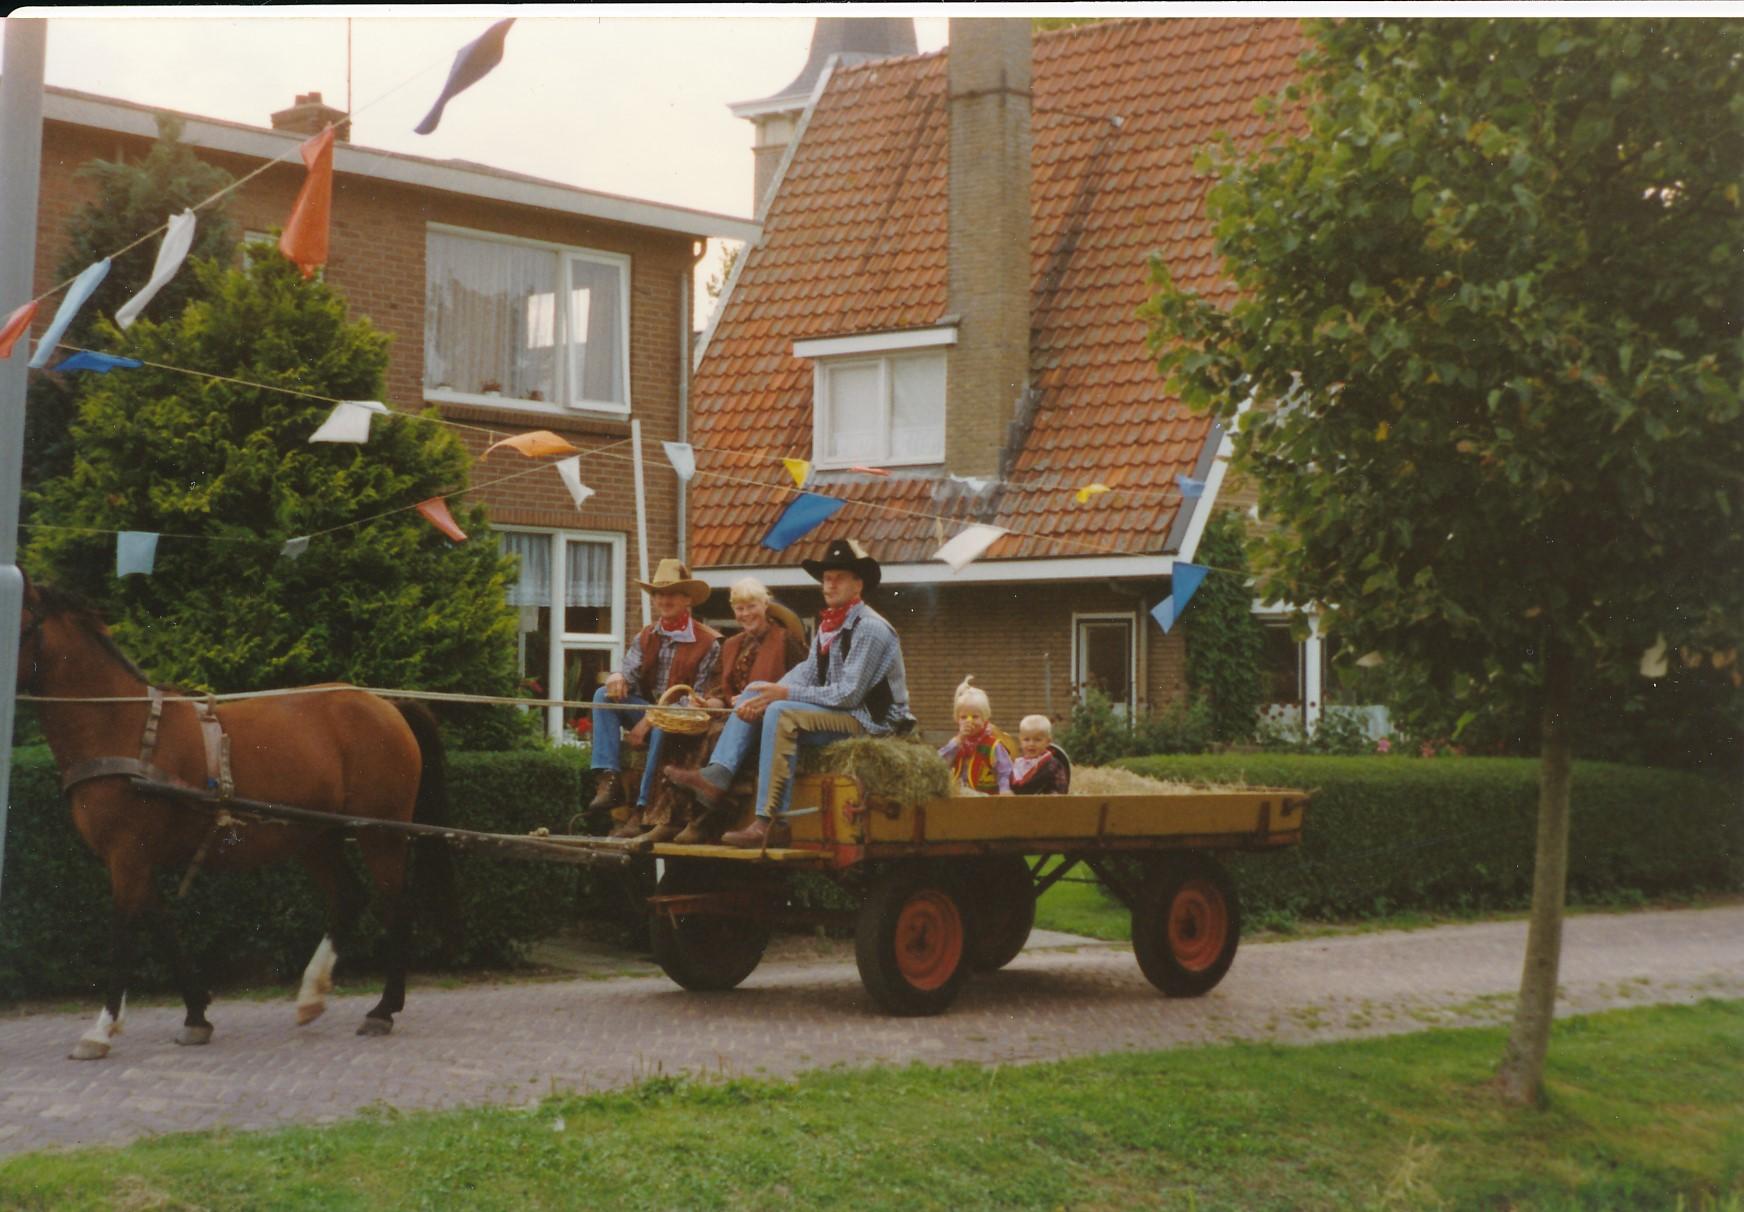 Fotoalbum Anneke Miedema, 010, Merke 1994, augustus, Frits Miedema, Baukje Boersma en Cor Miedema